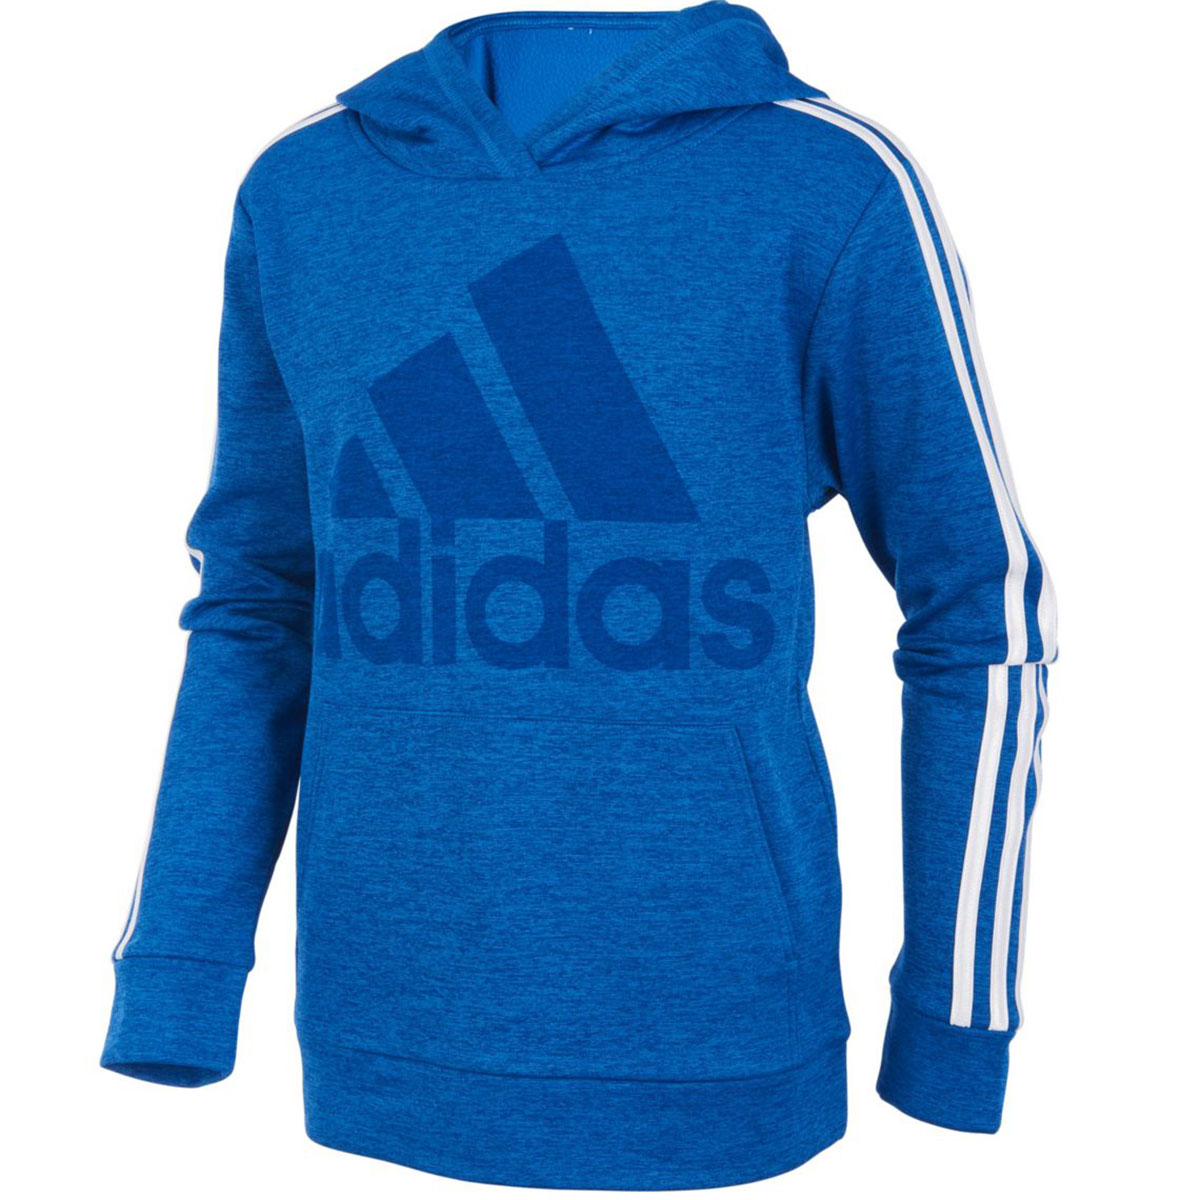 Adidas Big Boys' Classic Pullover Hoodie - Blue, S